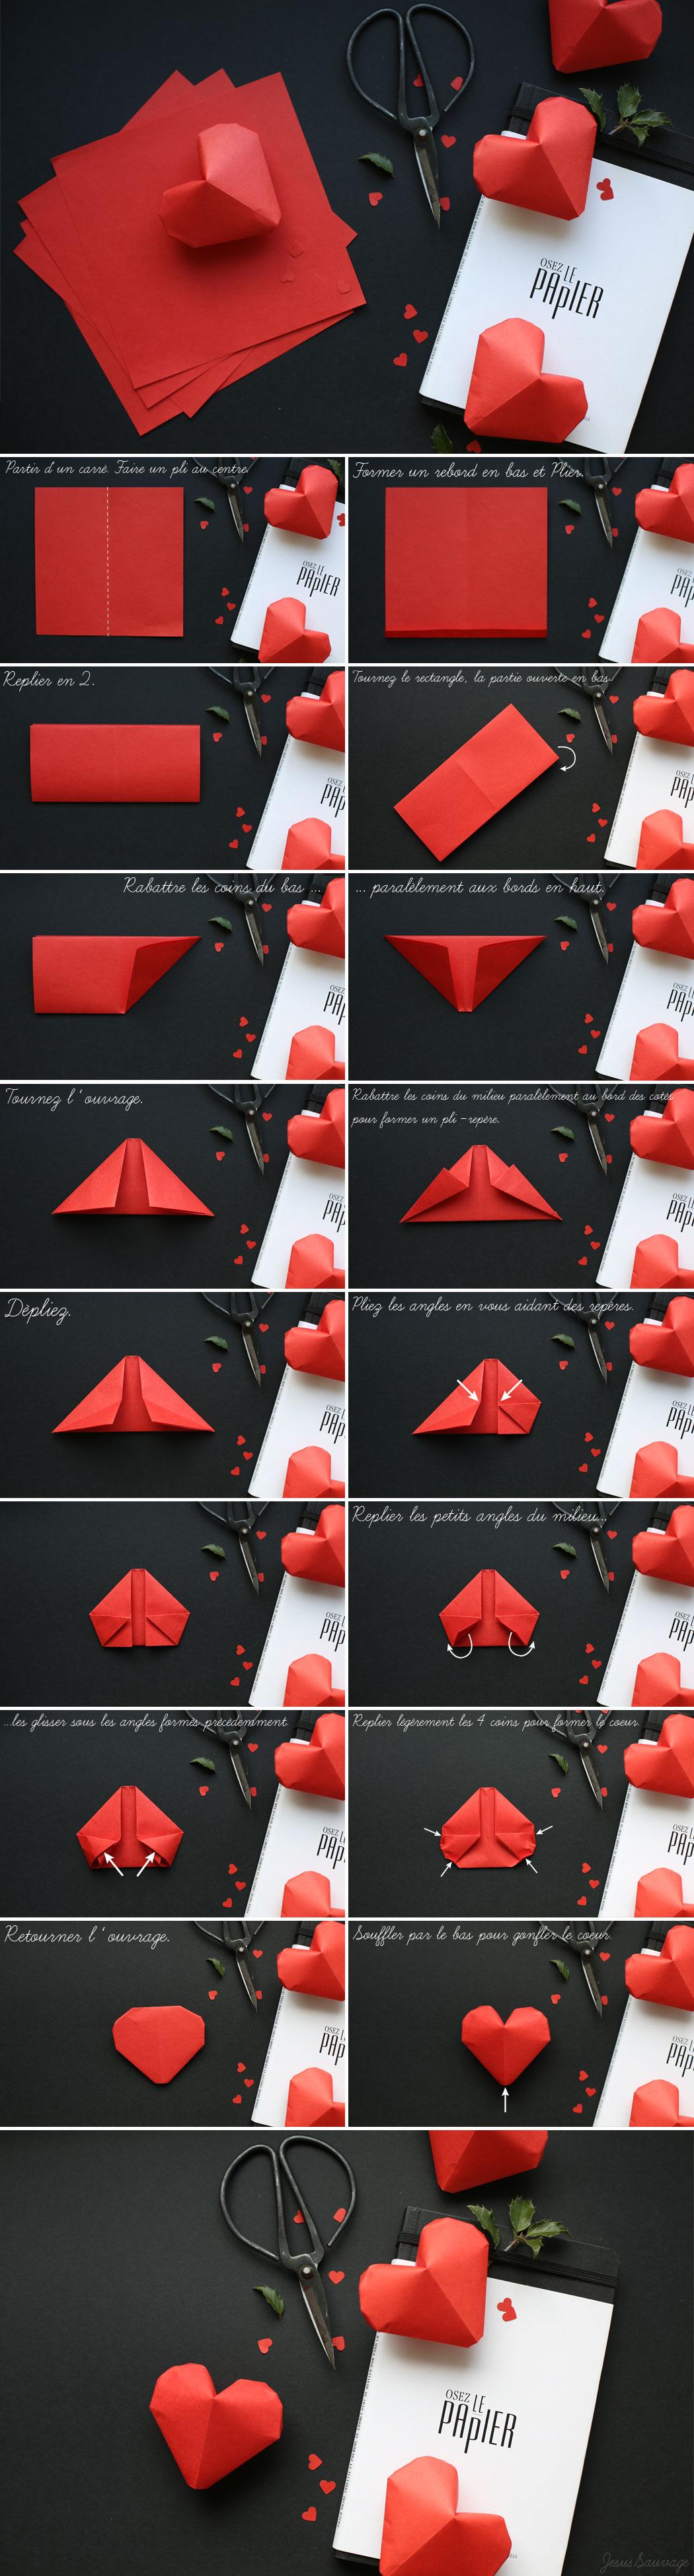 Origami_coeur_inflatable_saintvalentin_jesussauvage